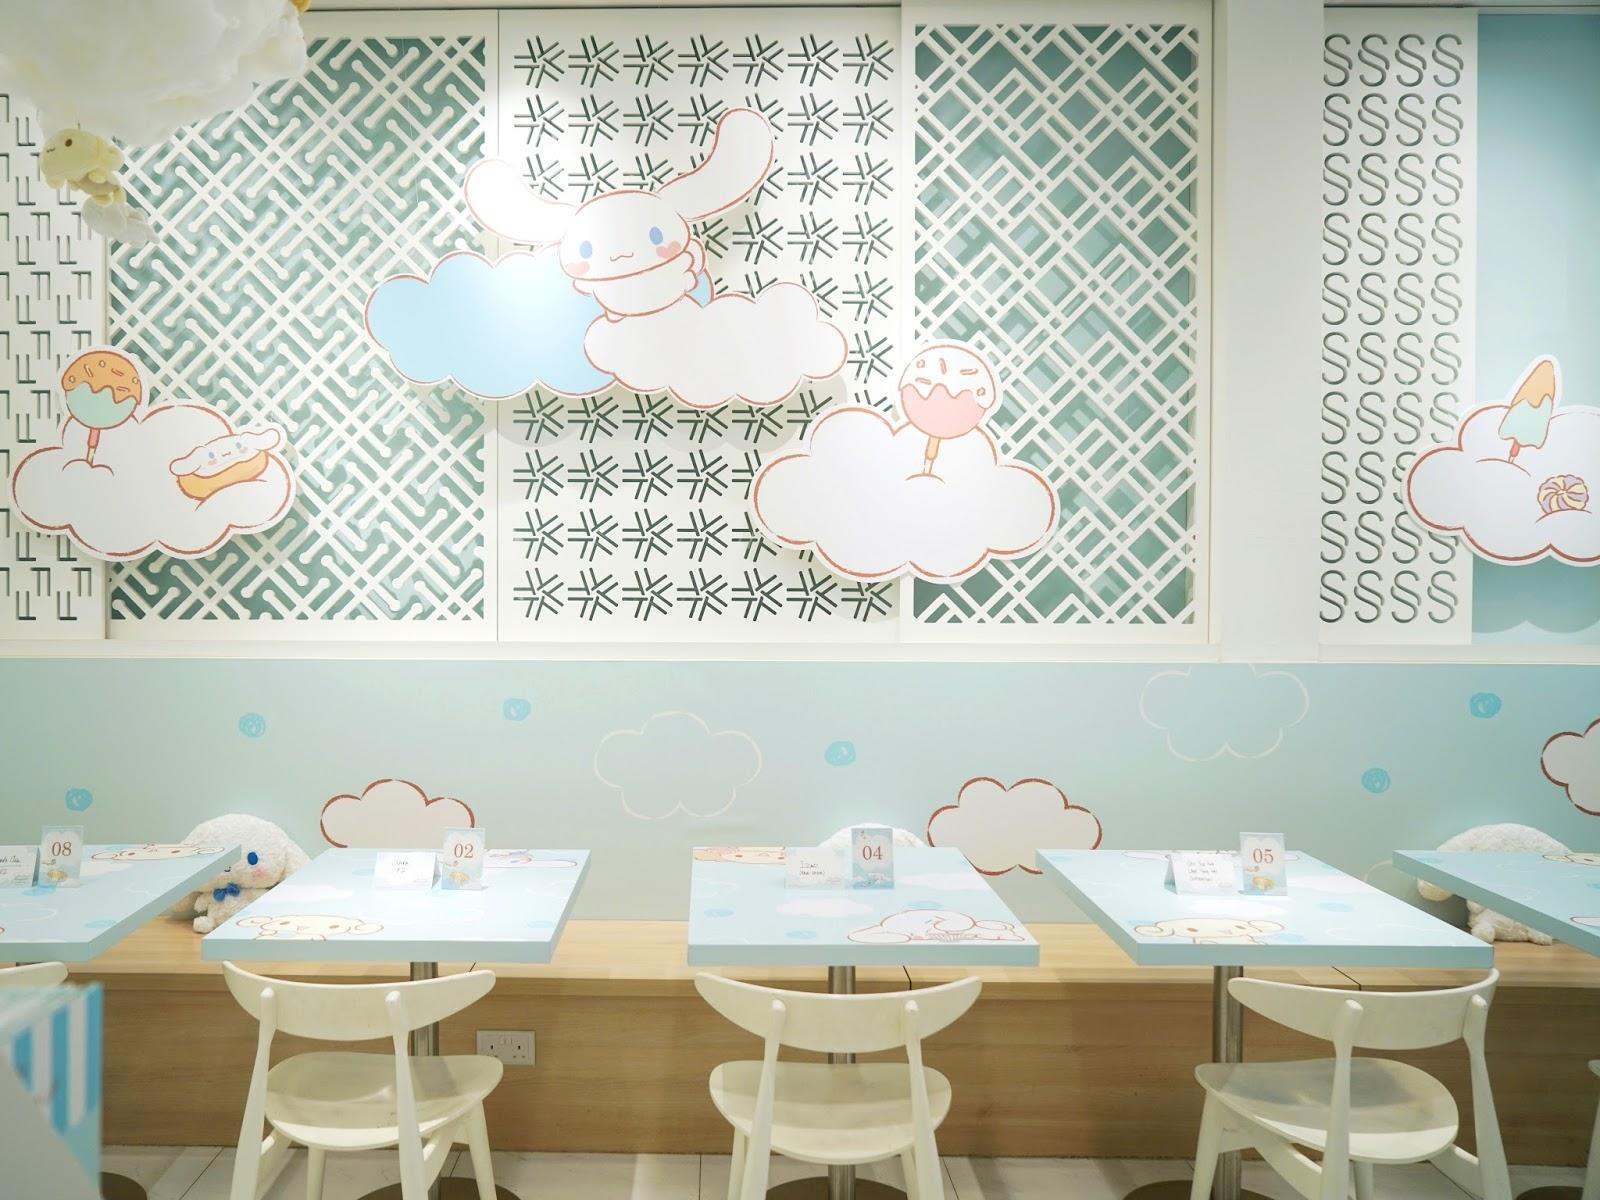 Read Kumoya Jalan Klapa Japanese Inspired Dessert Cafe Karafuru Reborn With Savory Items